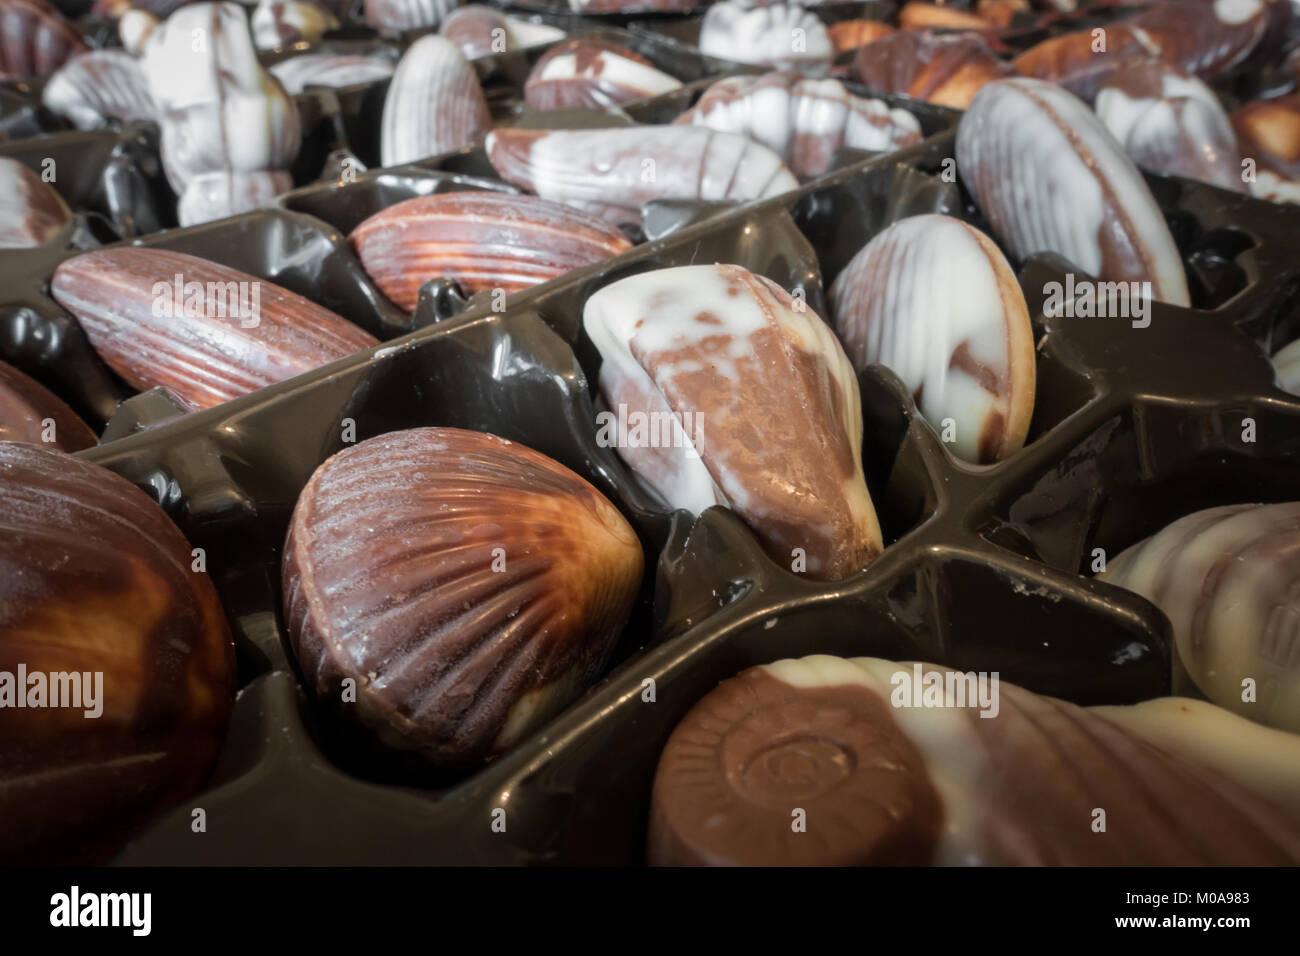 guylian-belgium-chocolate-truffle-shells-in-their-packaging-M0A983.jpg